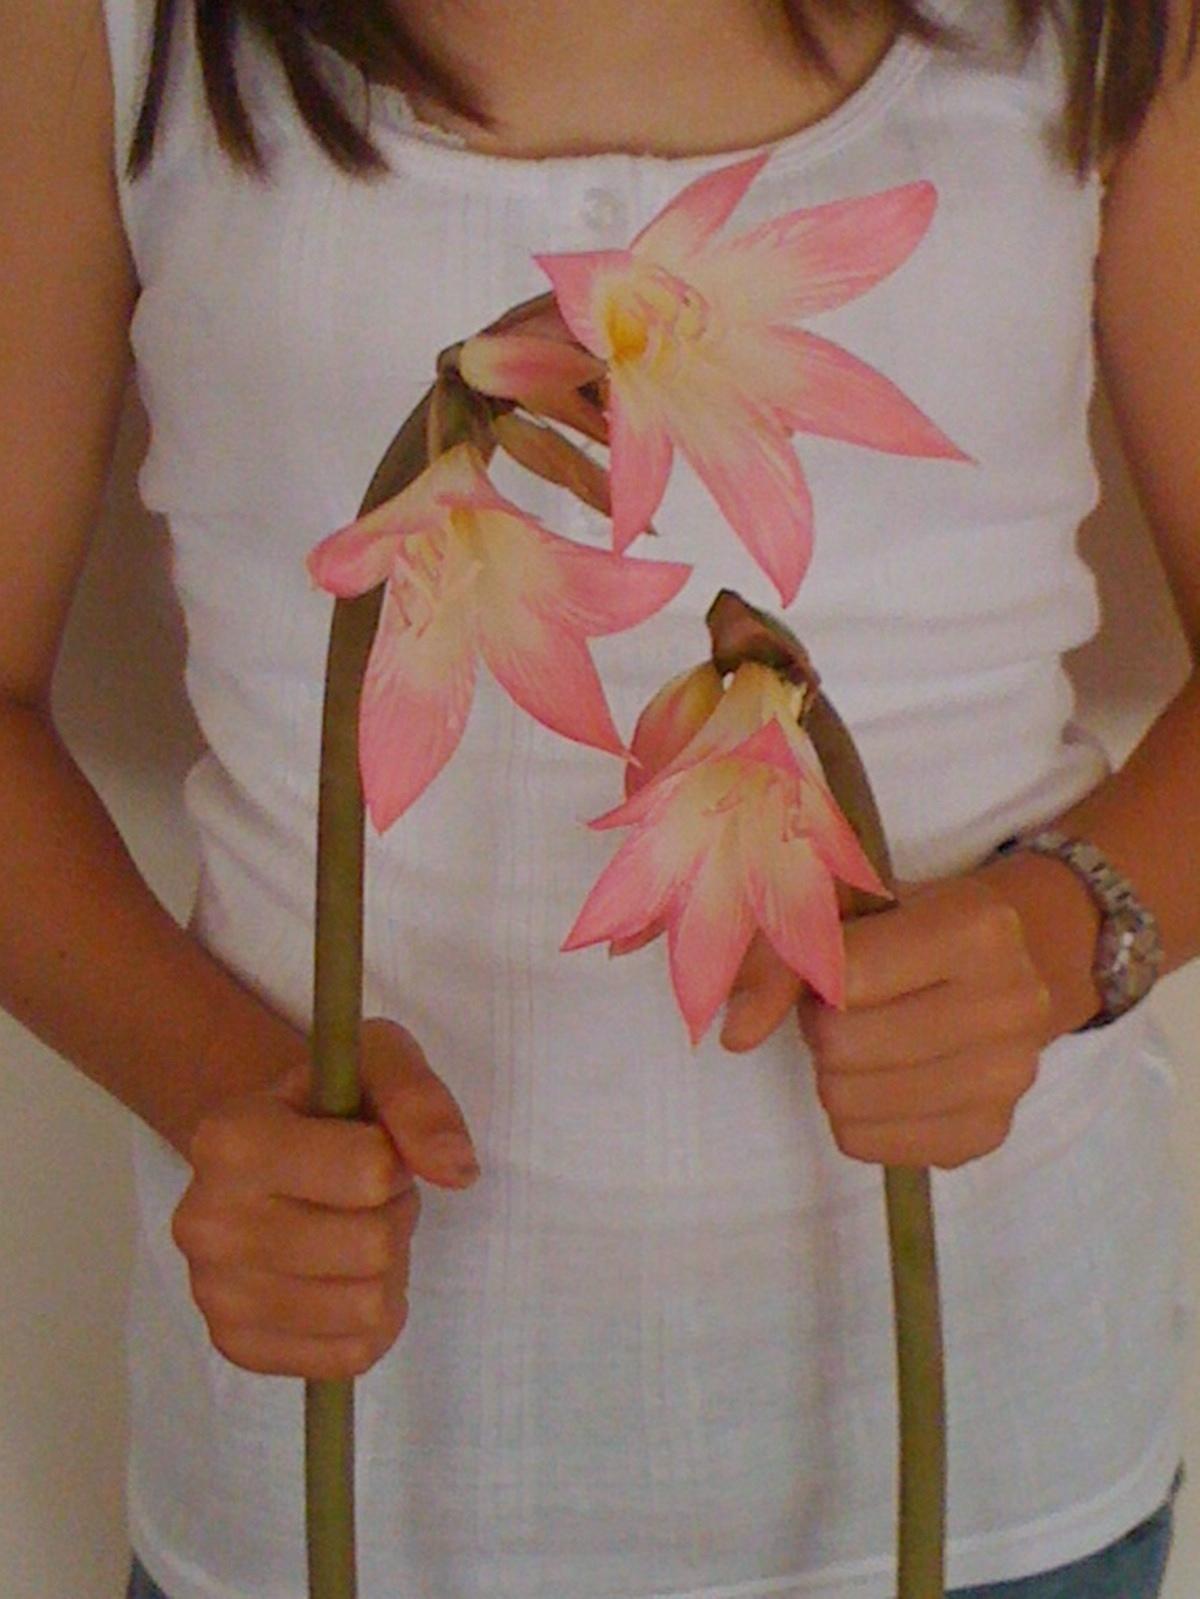 Alessandra Zecchini Pink Flowers Underwater Gardening Kiwi berries